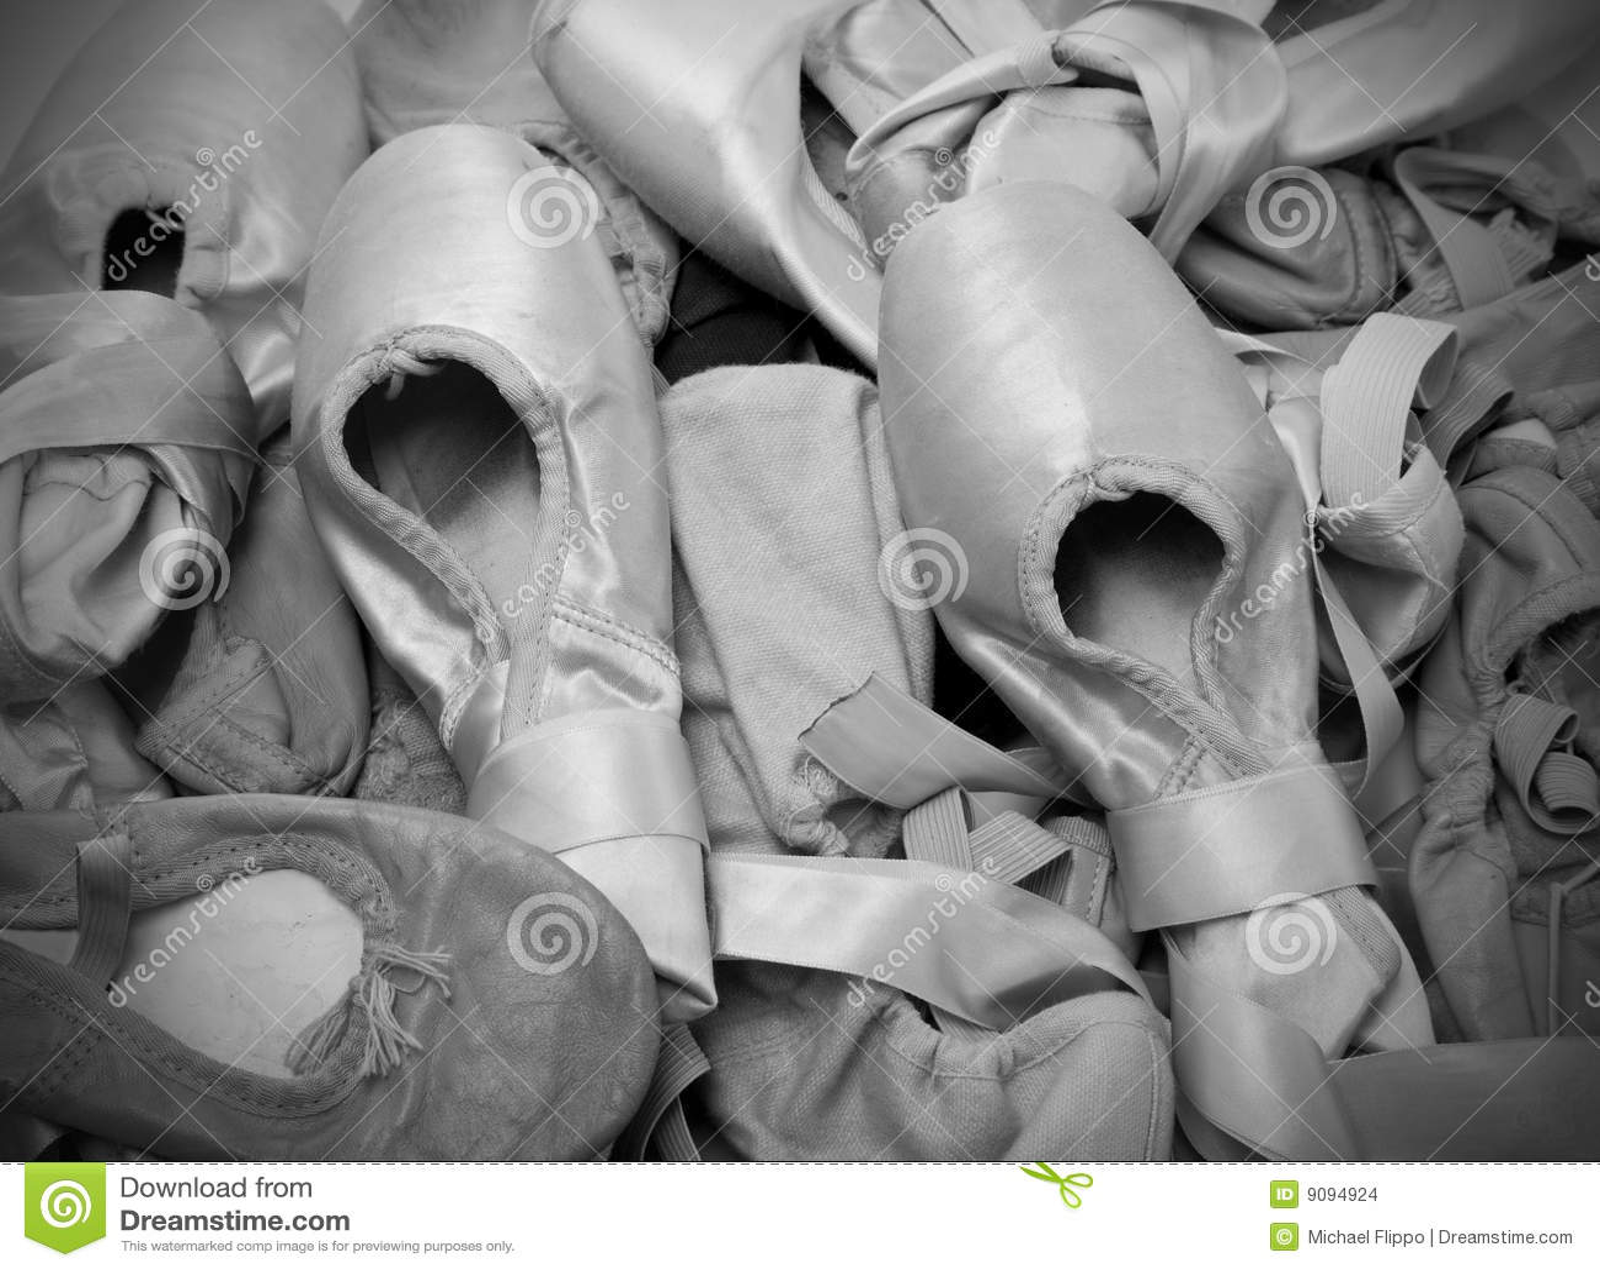 Ballett-Schuhe oder Hefterzufuhren